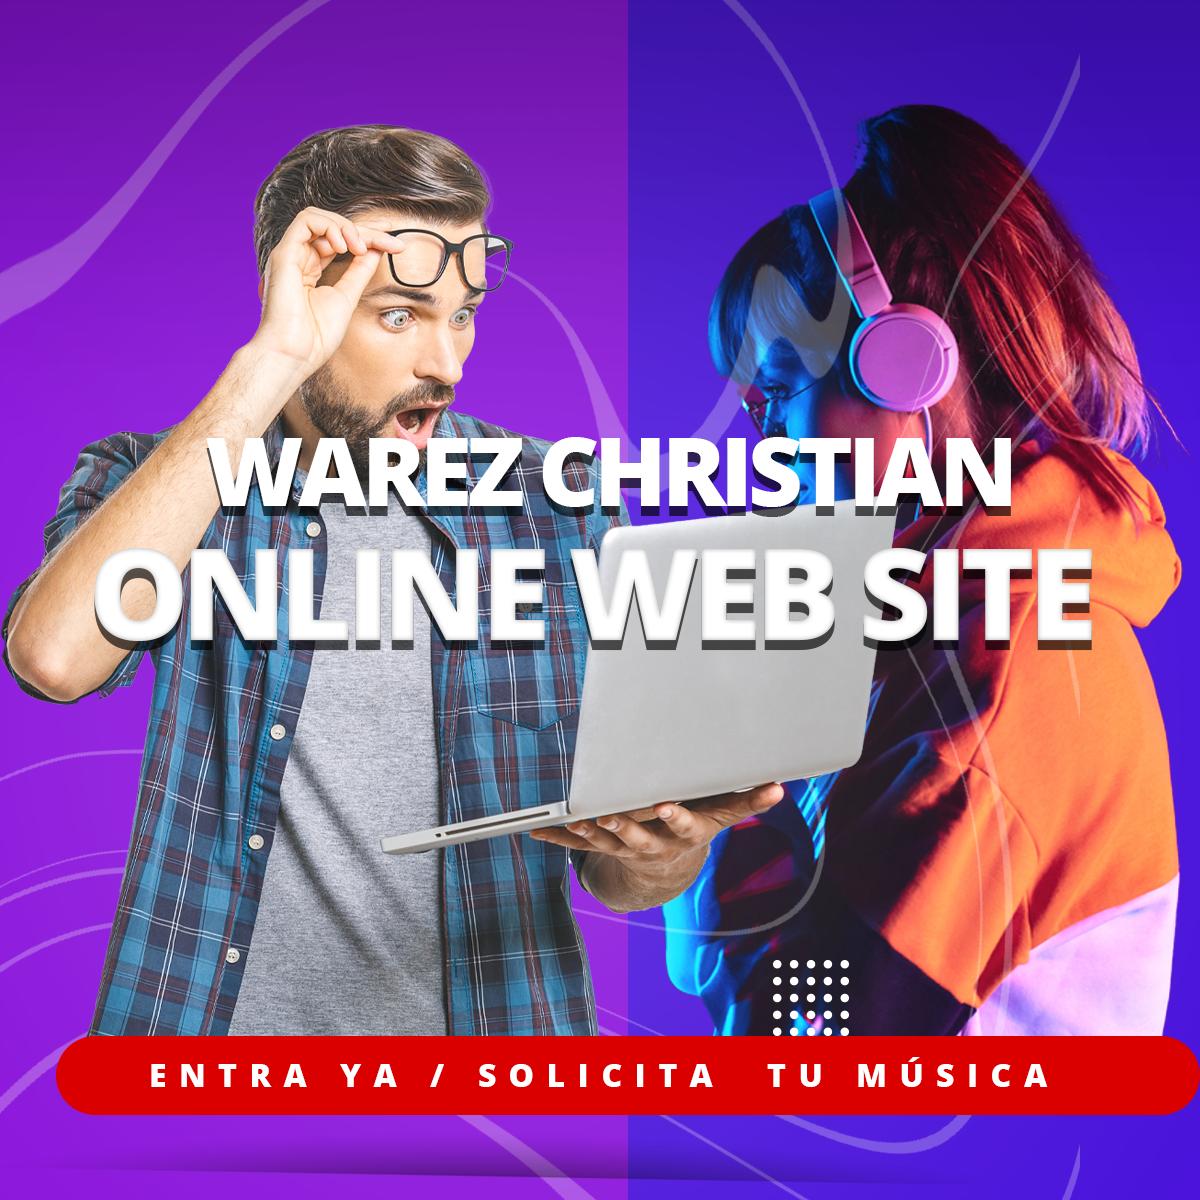 WarezChristian.com Estamos de regreso Online Web Site 2021